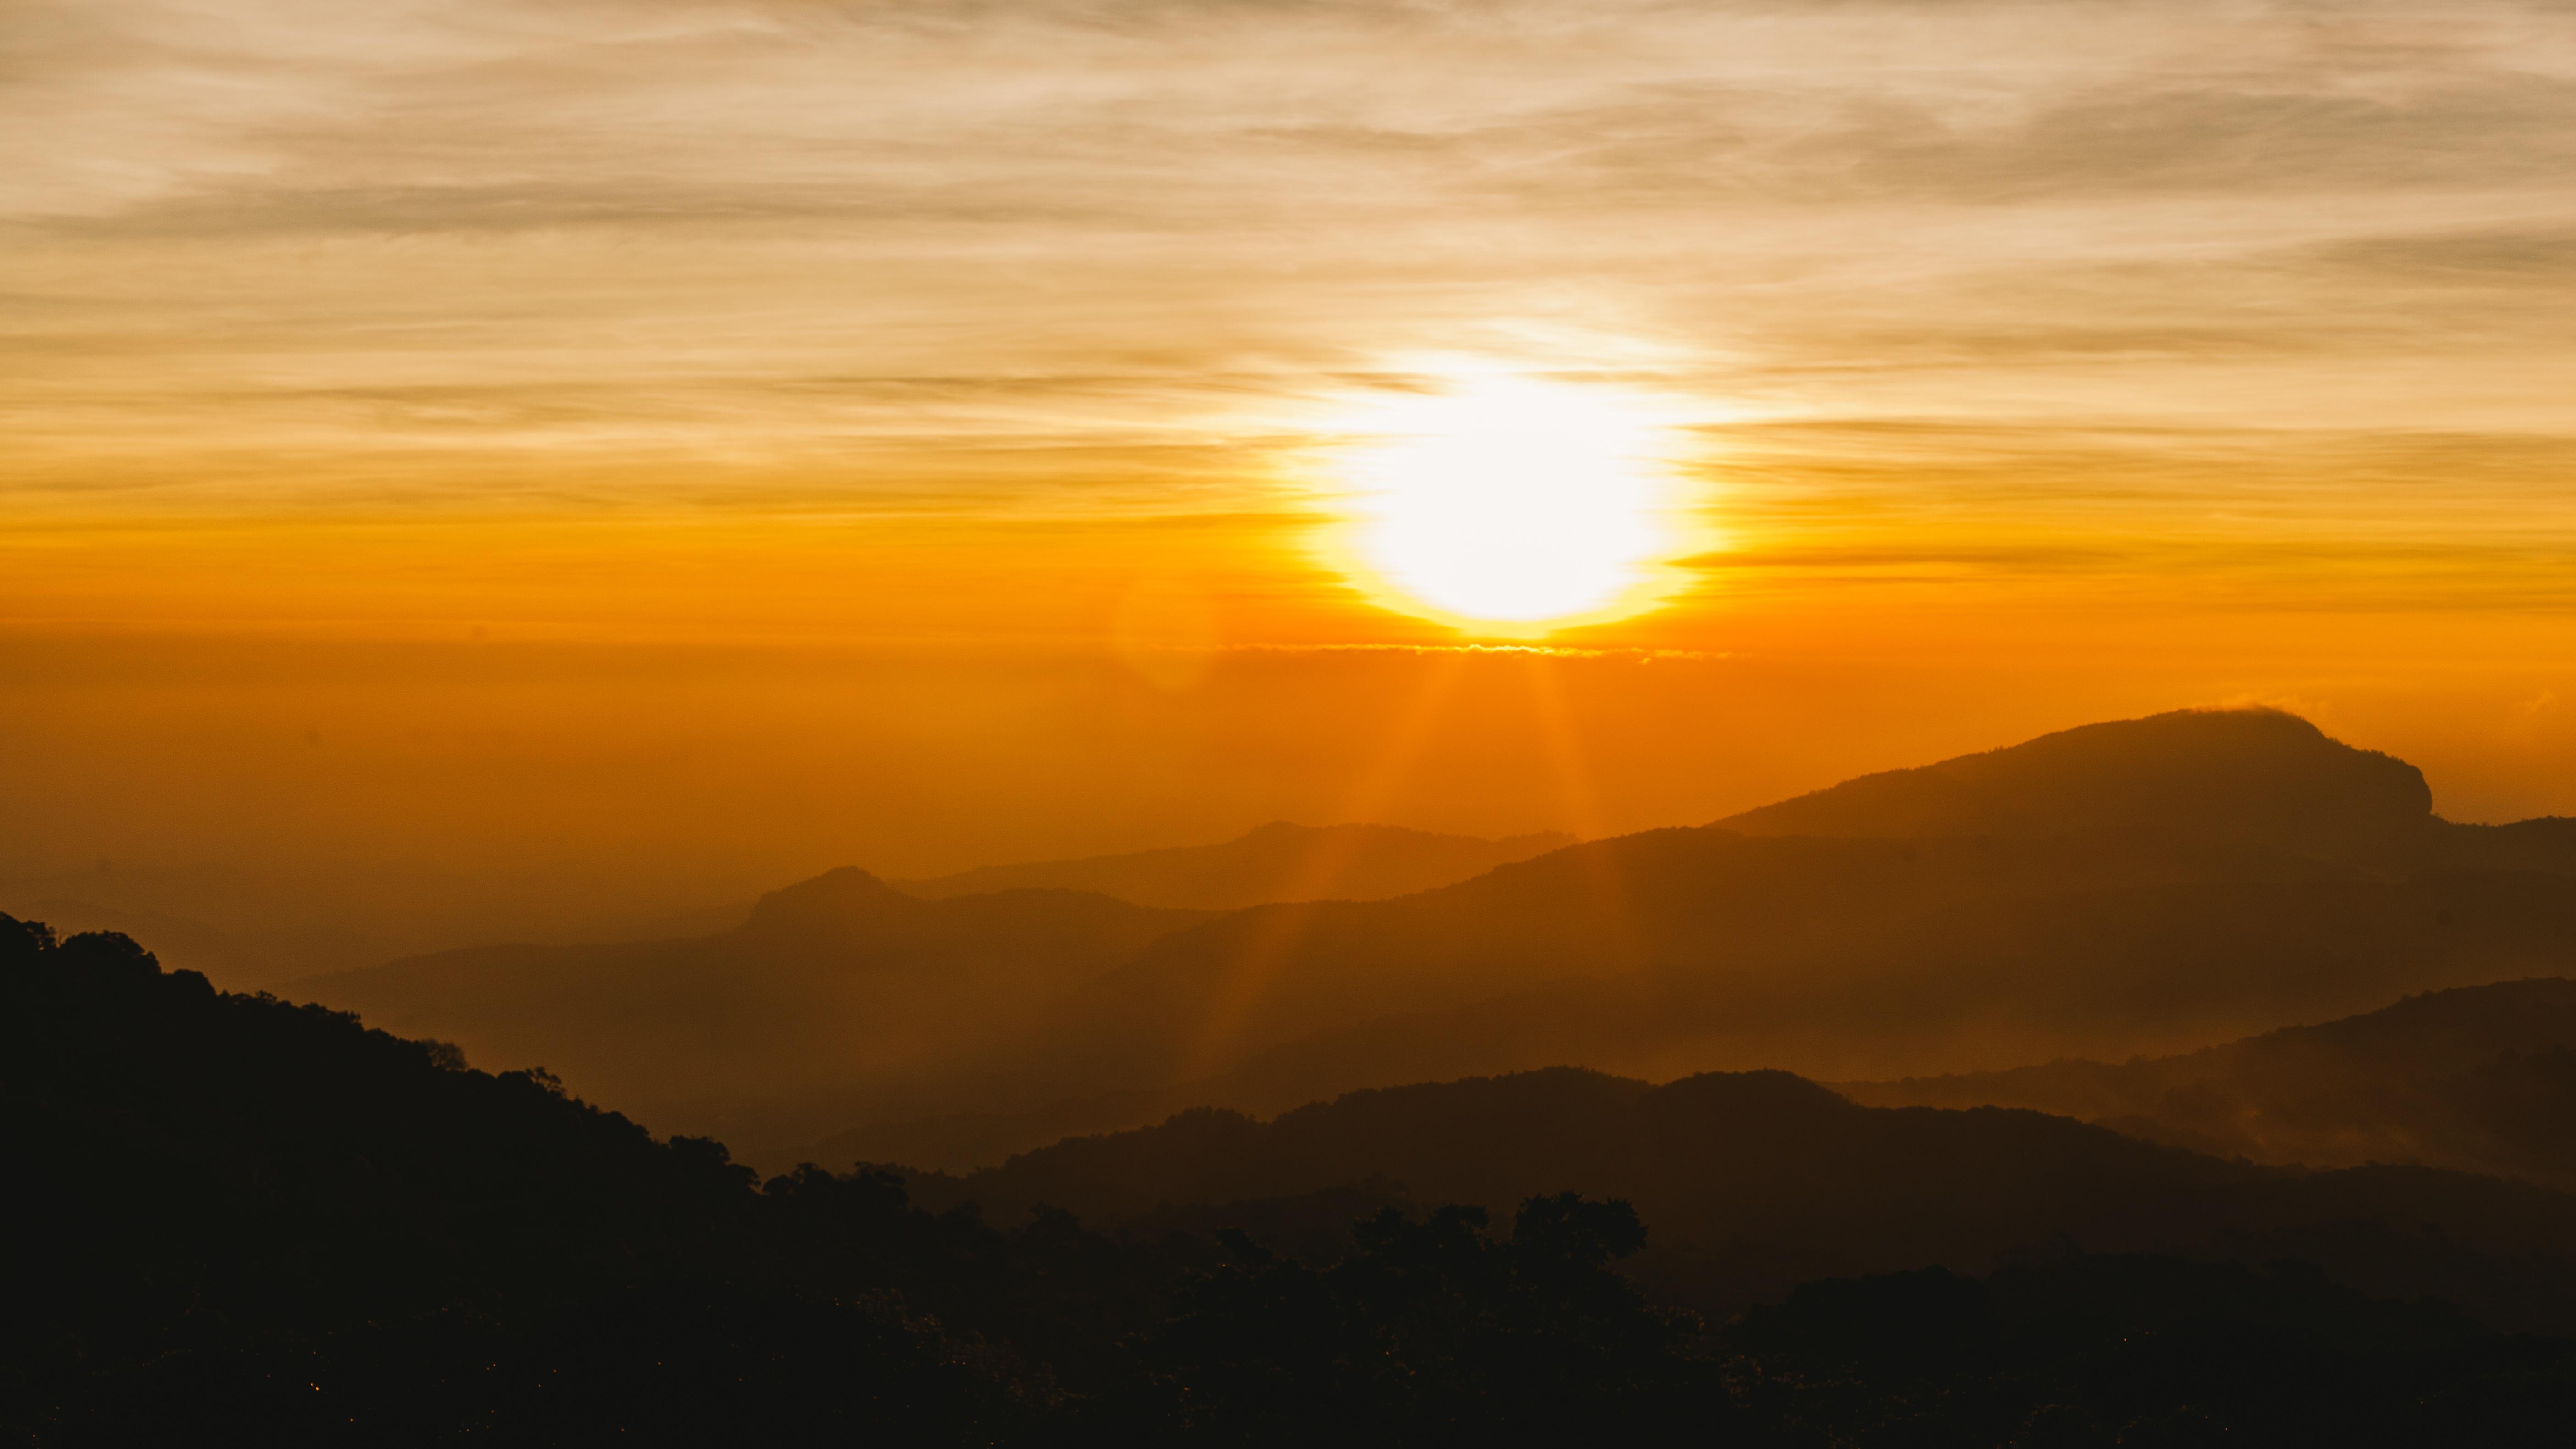 Free images watch landscape horizon mountain cloud sun watch landscape horizon mountain cloud sky sun sunrise sunset sunlight morning hill view dawn atmosphere daytime altavistaventures Images